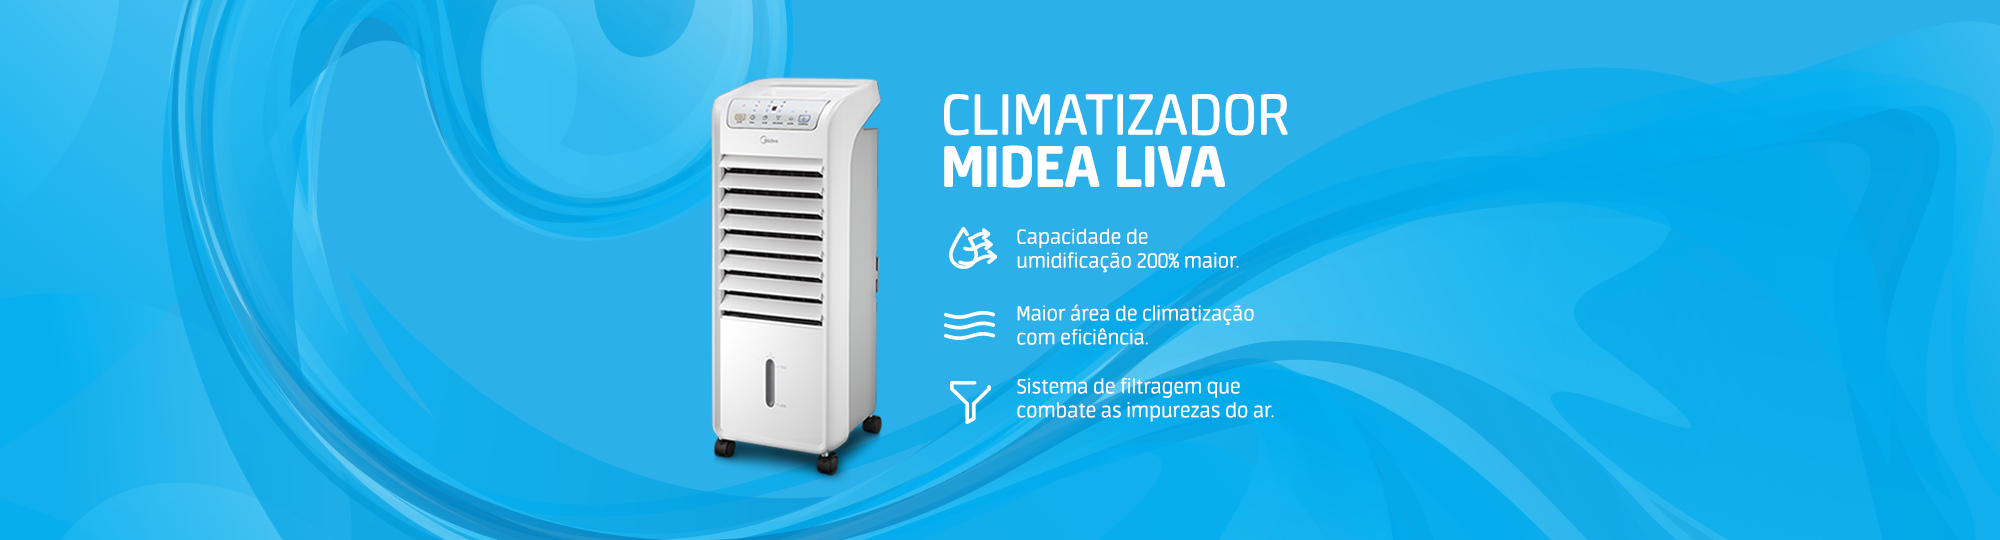 Climatizador Midea Liva